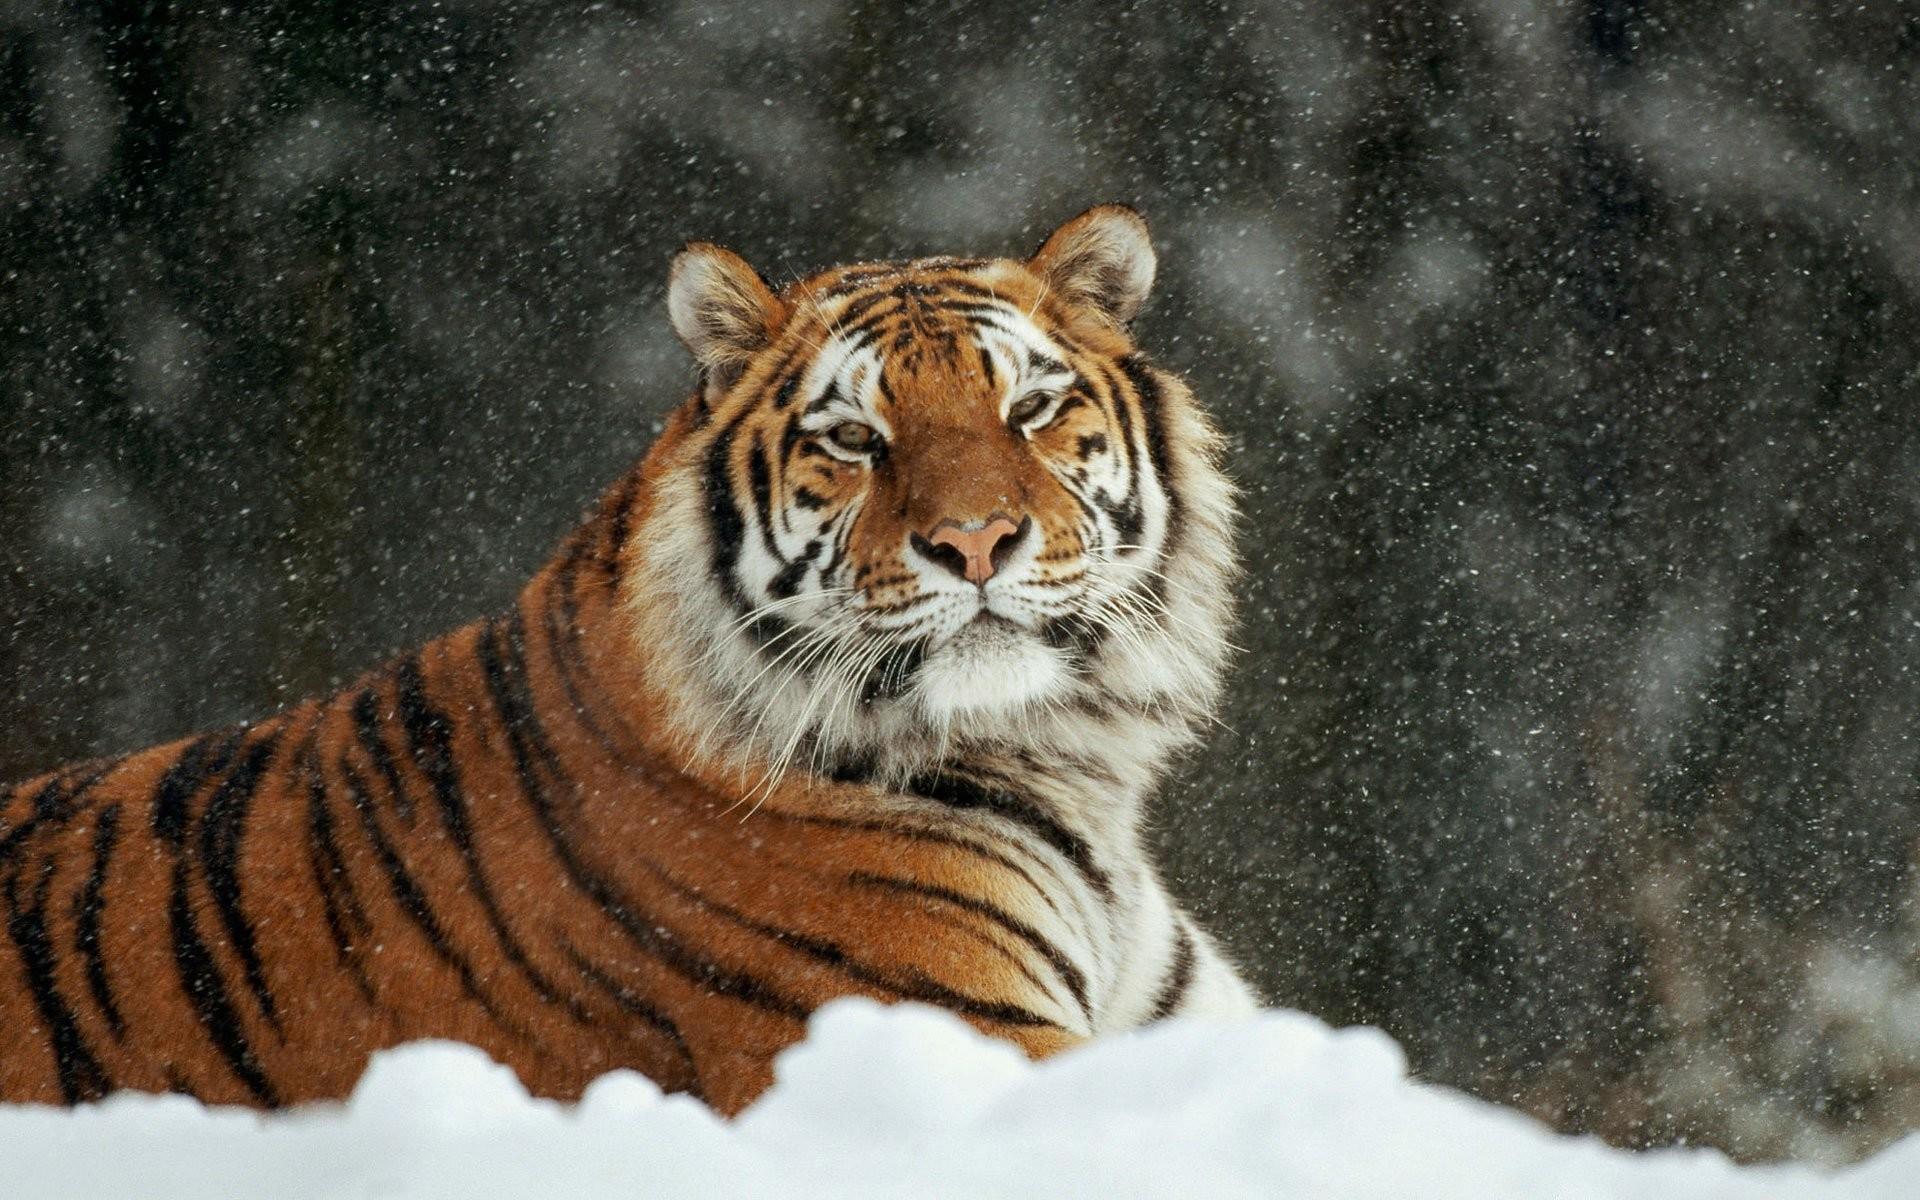 Desktop Hd Baby White Tiger Wallpapers 1024×768 Tiger Wallpapers Desktop  (53 Wallpapers)